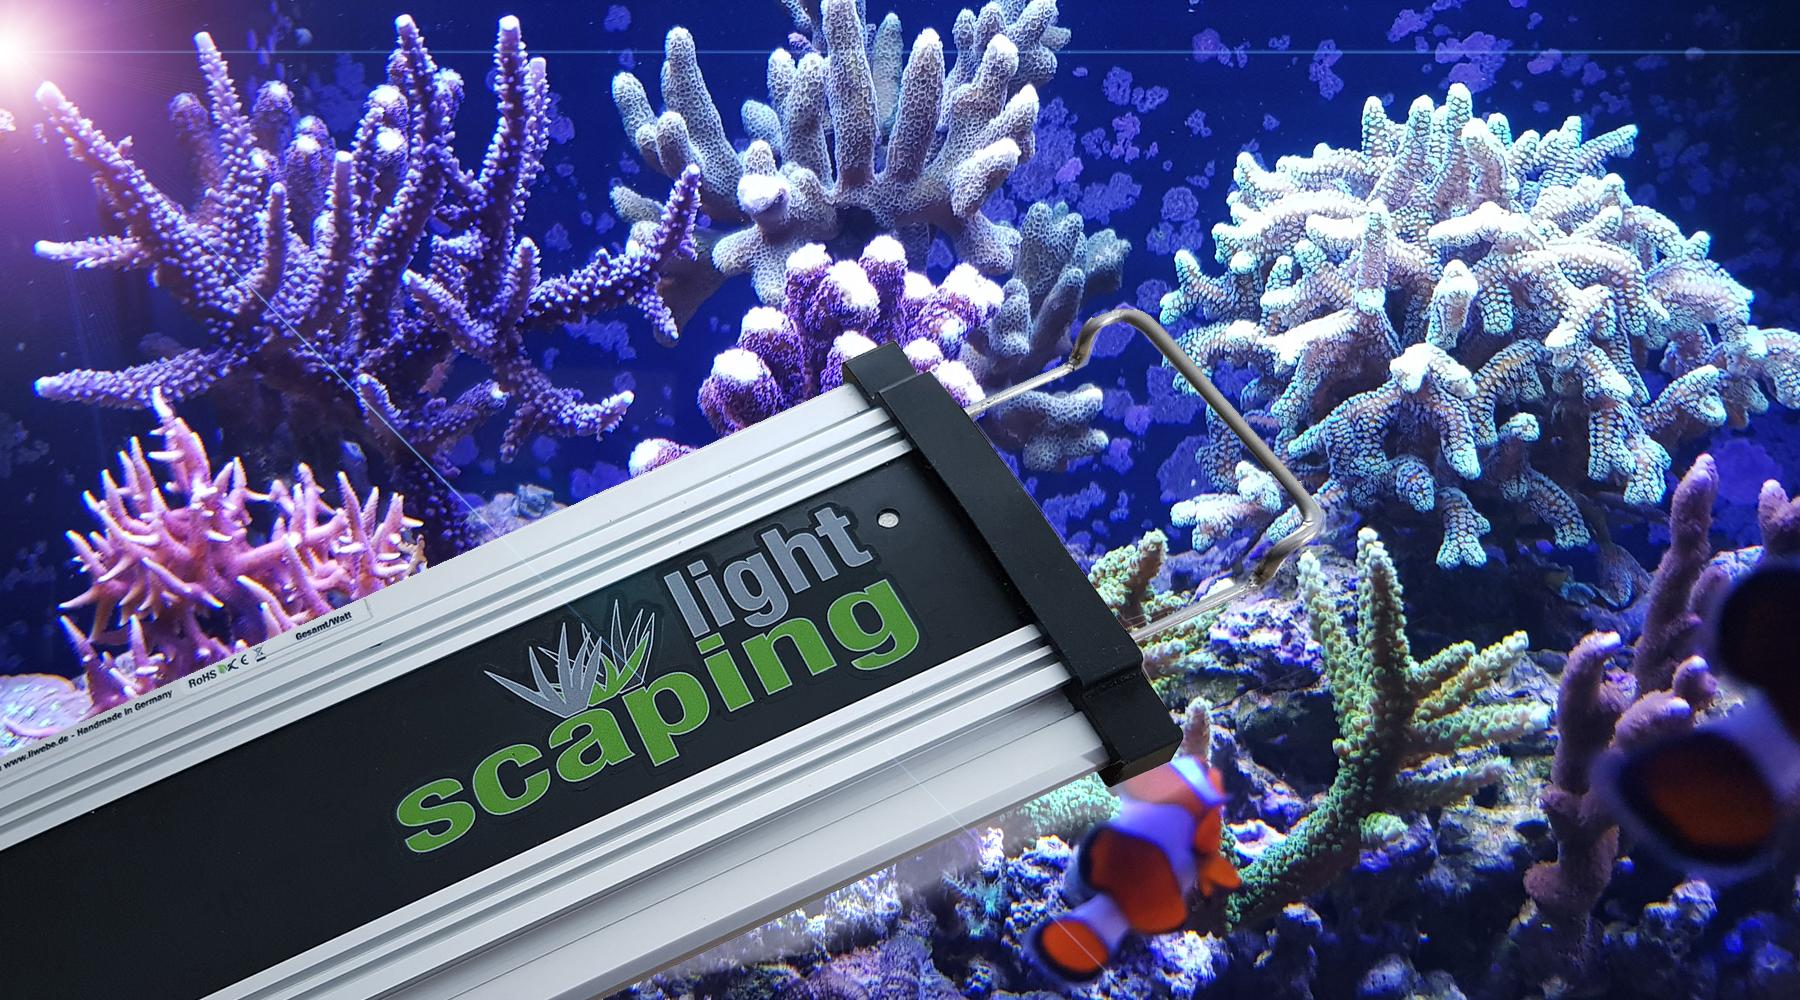 Scaping Light LED - Nautic UV